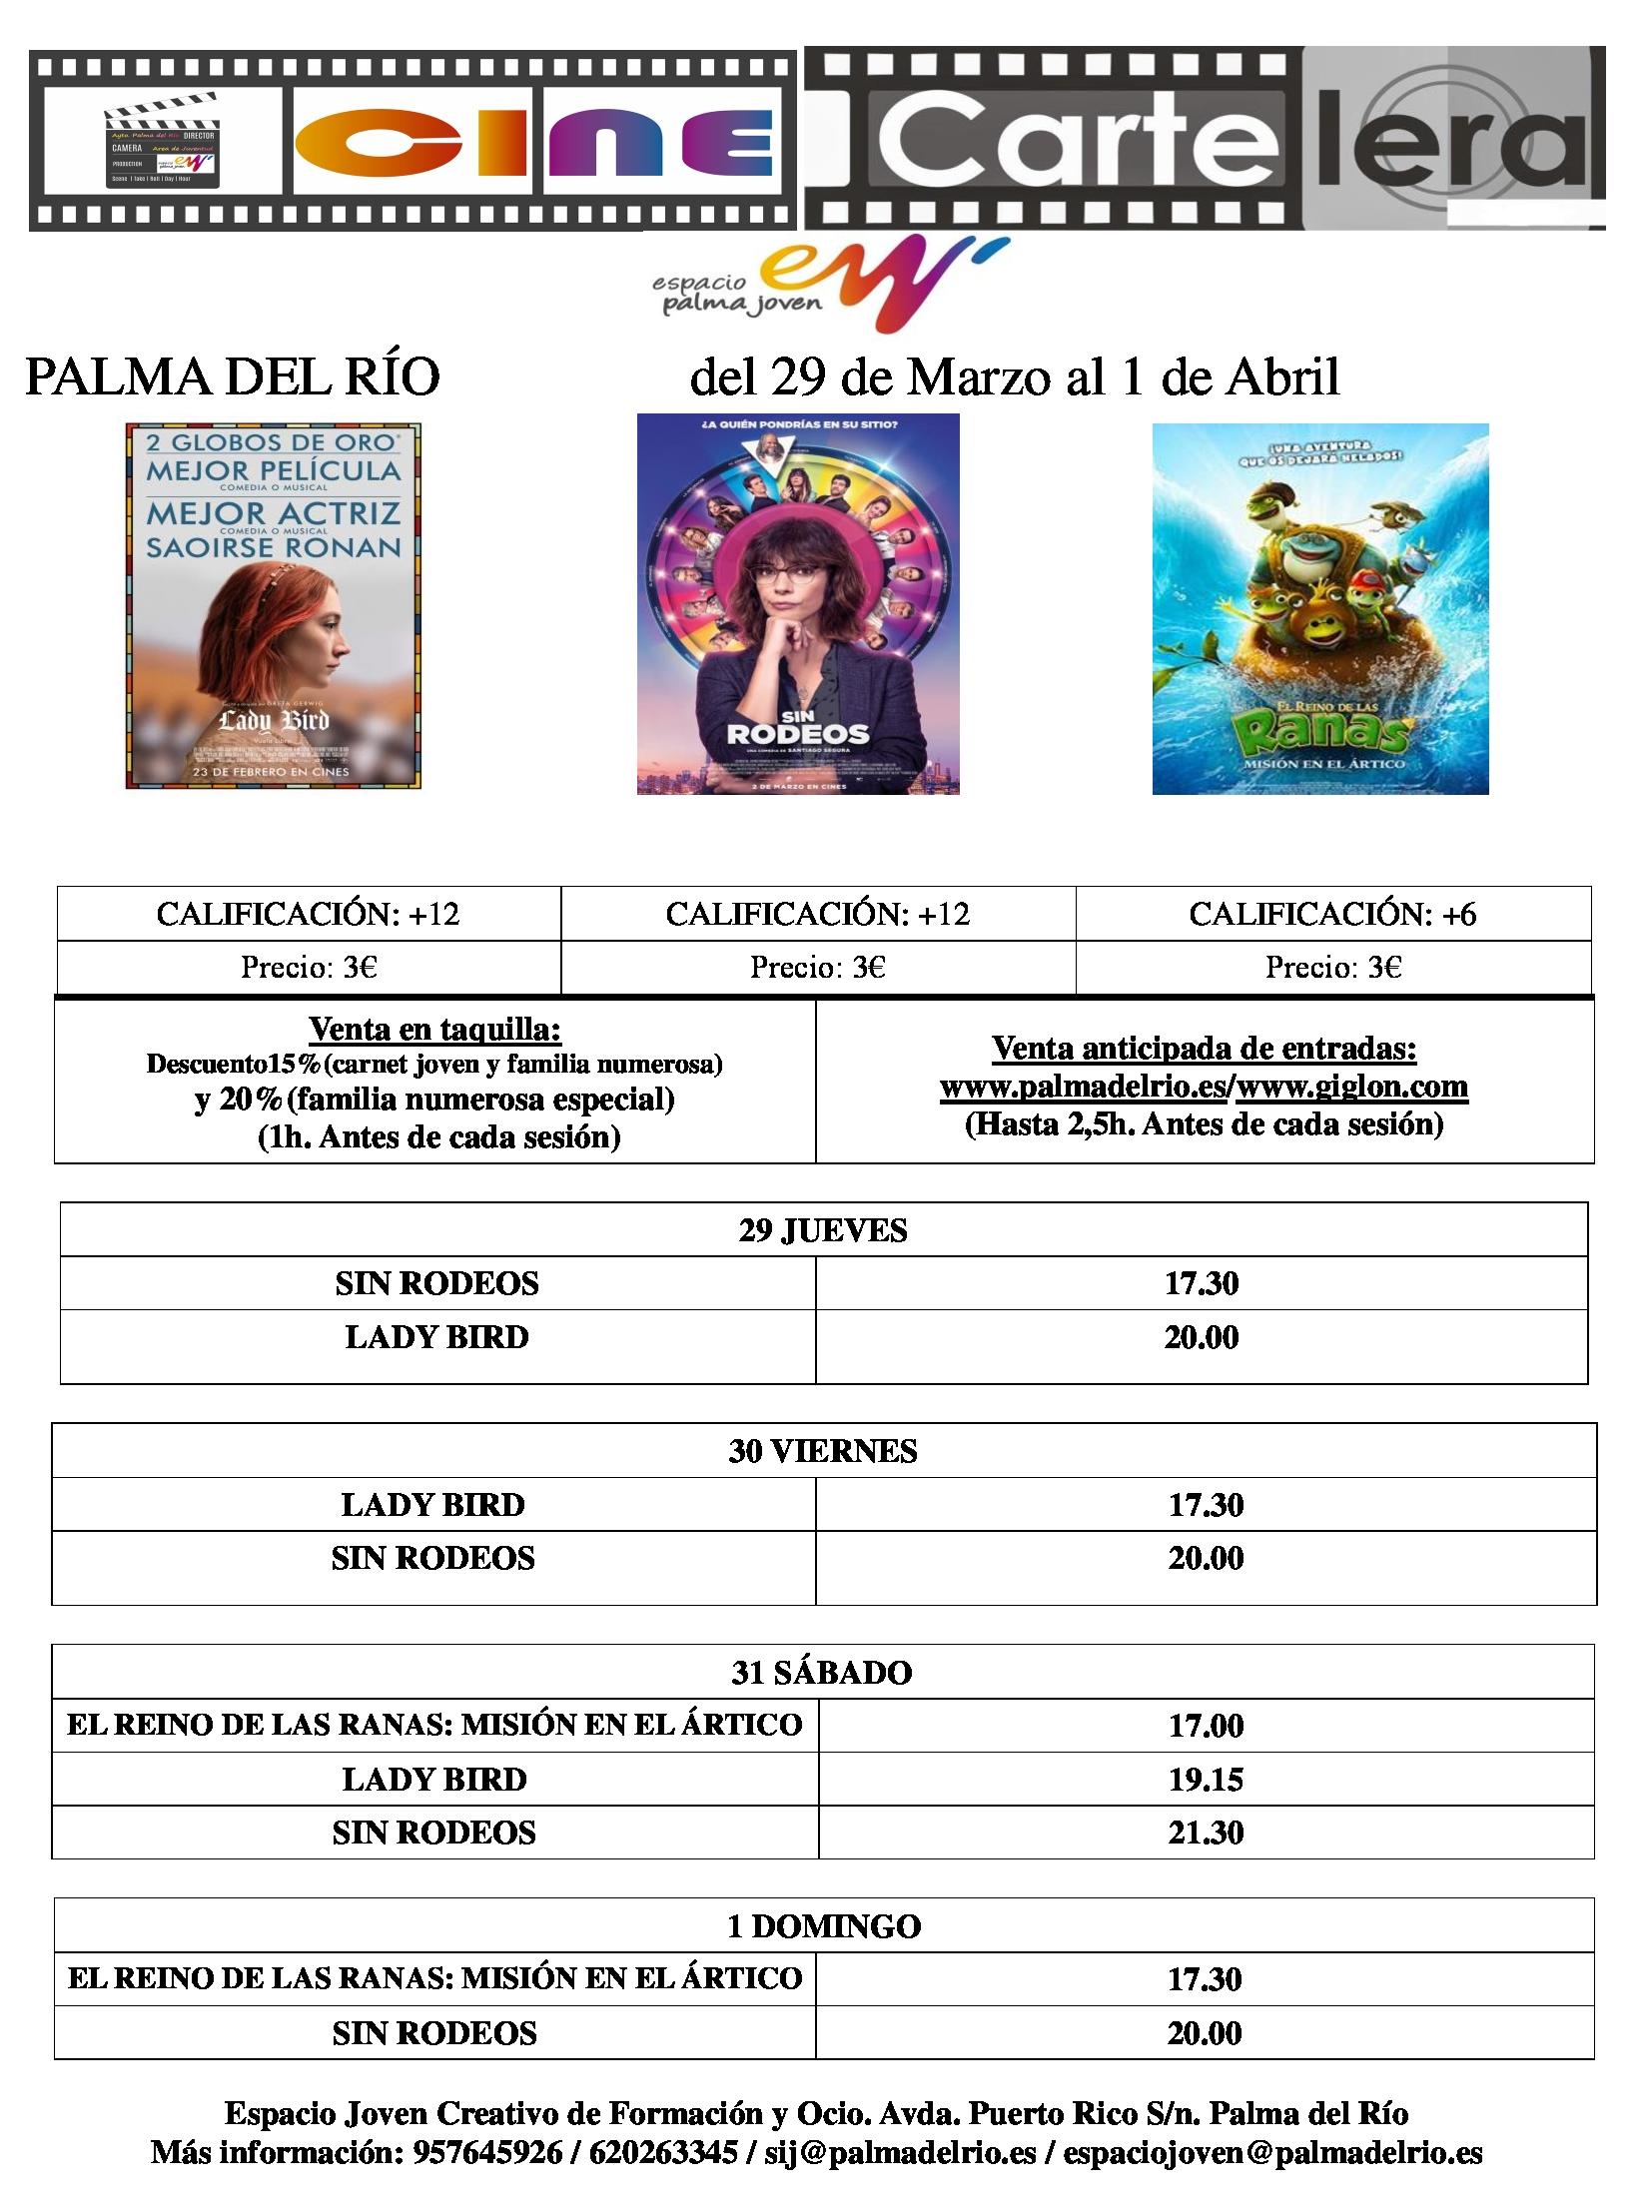 https://www.palmadelrio.es/sites/default/files/cartelera_0.jpg